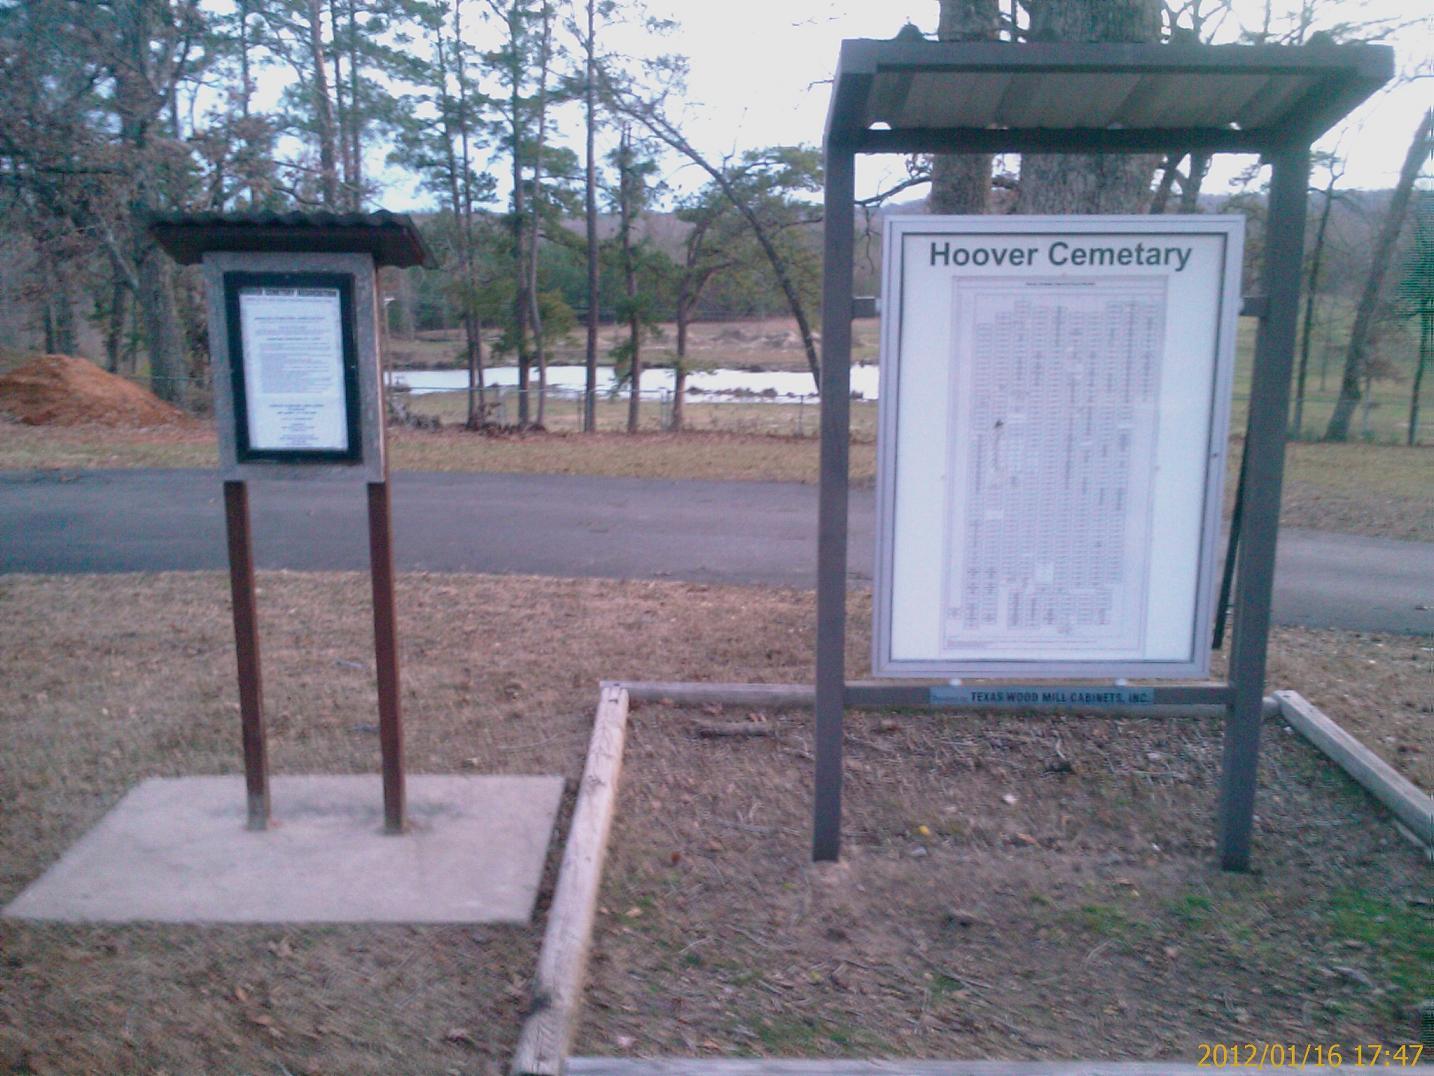 Hoover Cemetery